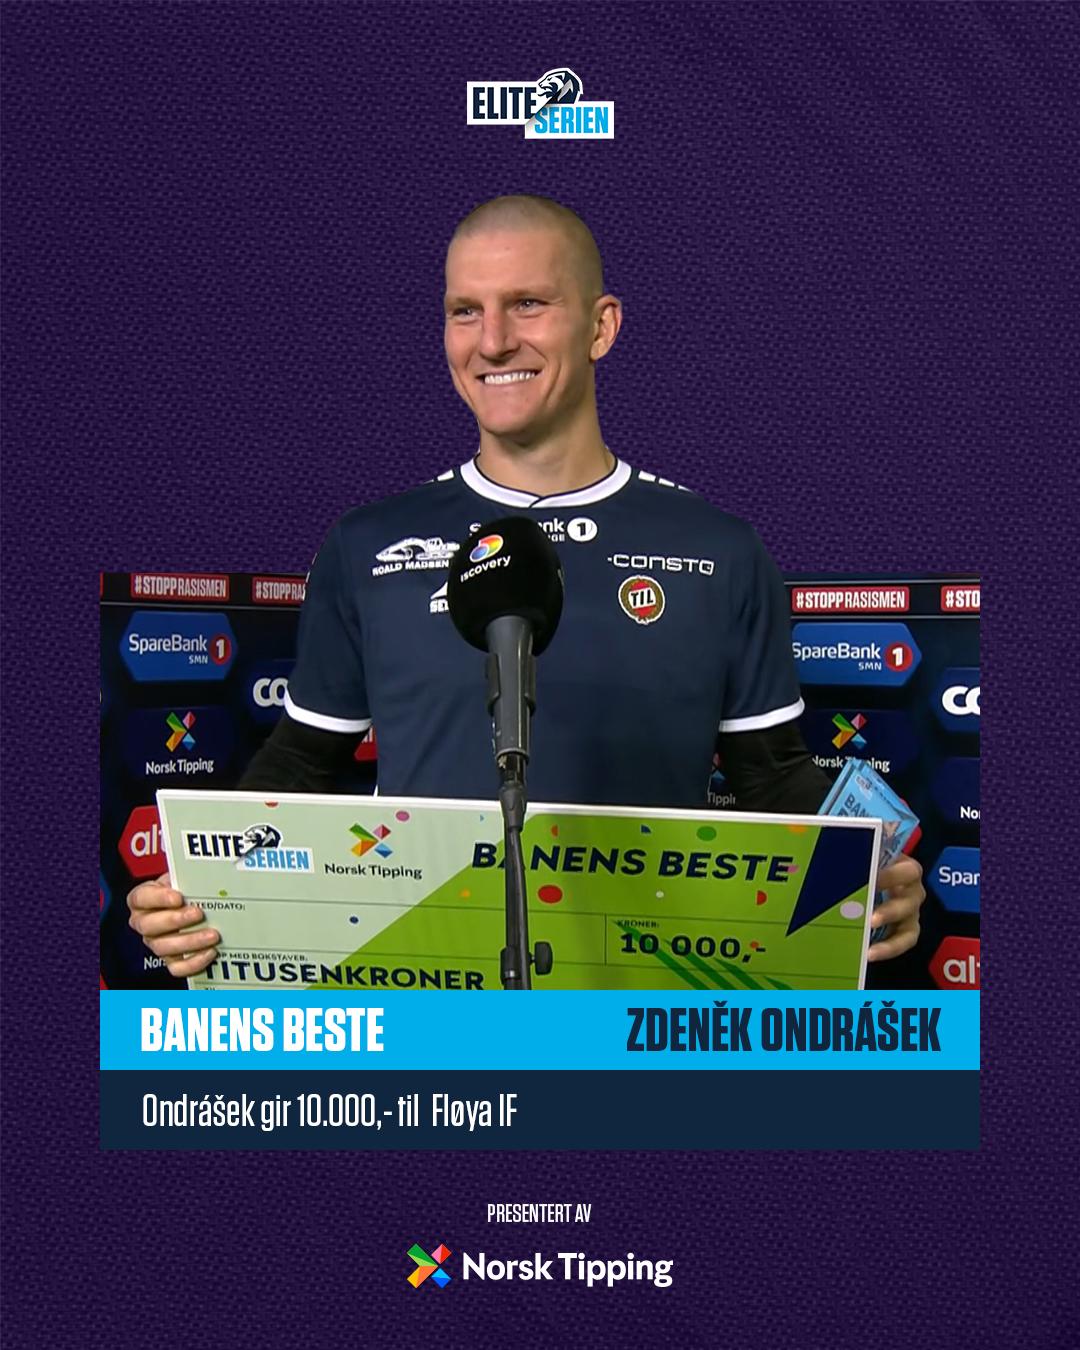 1080x1350 - Banens beste - Runde 18 - Zdeněk Ondrášek.png